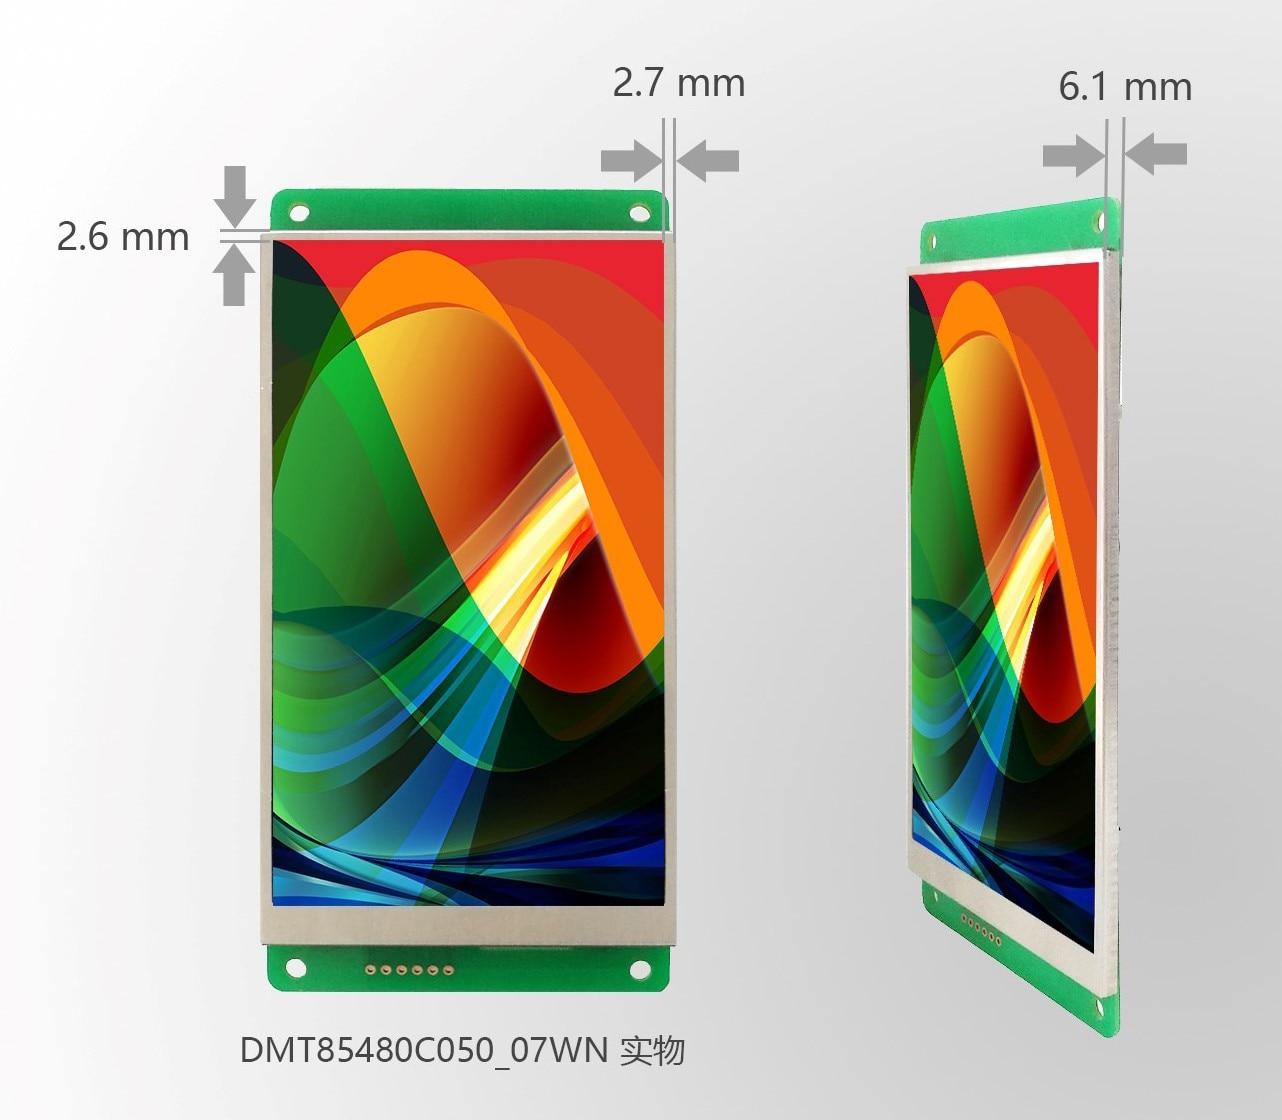 DMT85480C050_07W DMT85480C050_07WN/T DWIN 5 Inch Serial Screen DGUS II Narrow Frame IPS Screen Capacitive Touch Screen